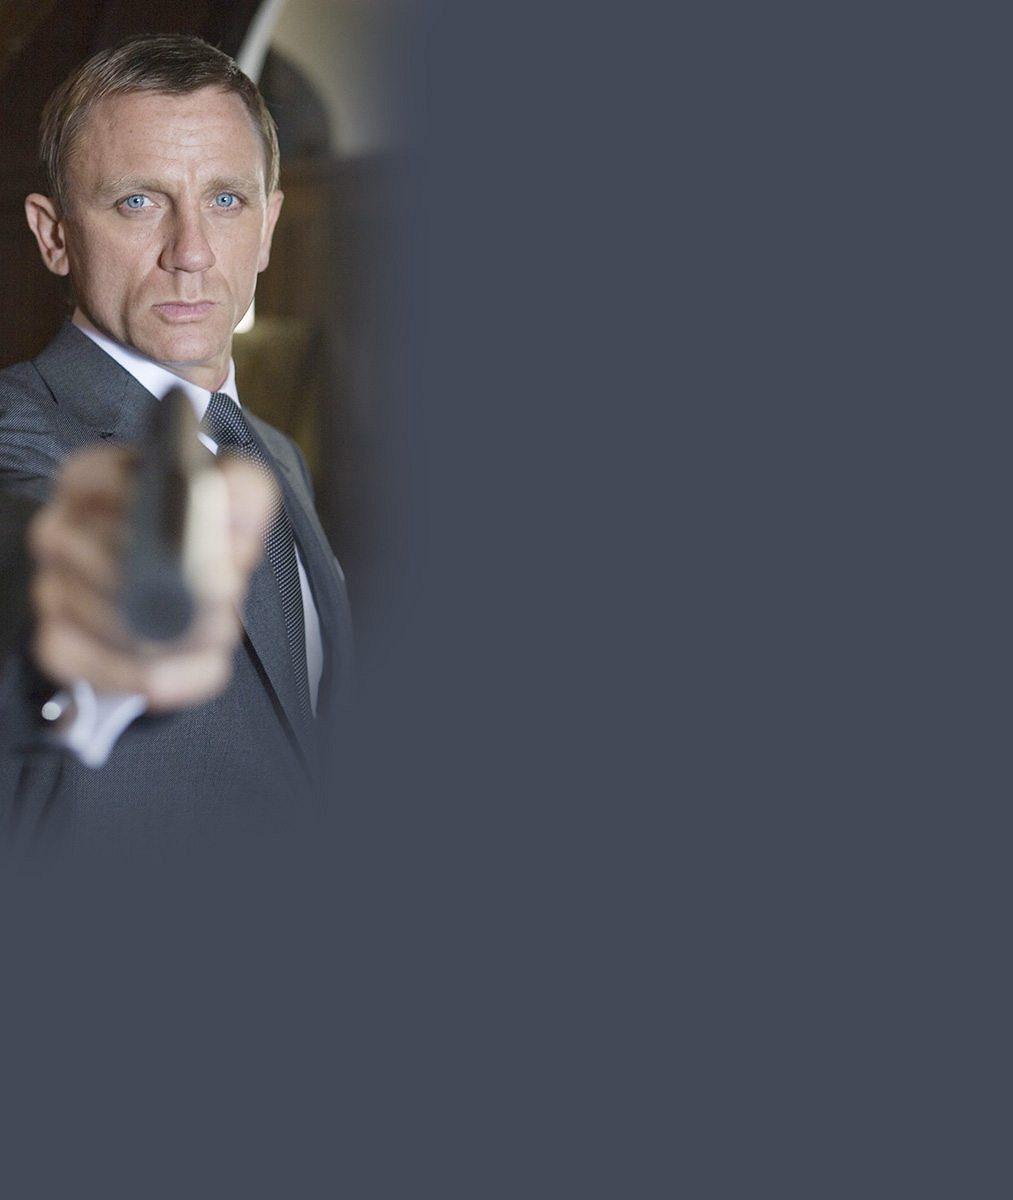 Daniel Craig jako James Bond skončil. Přijde o miliardy!